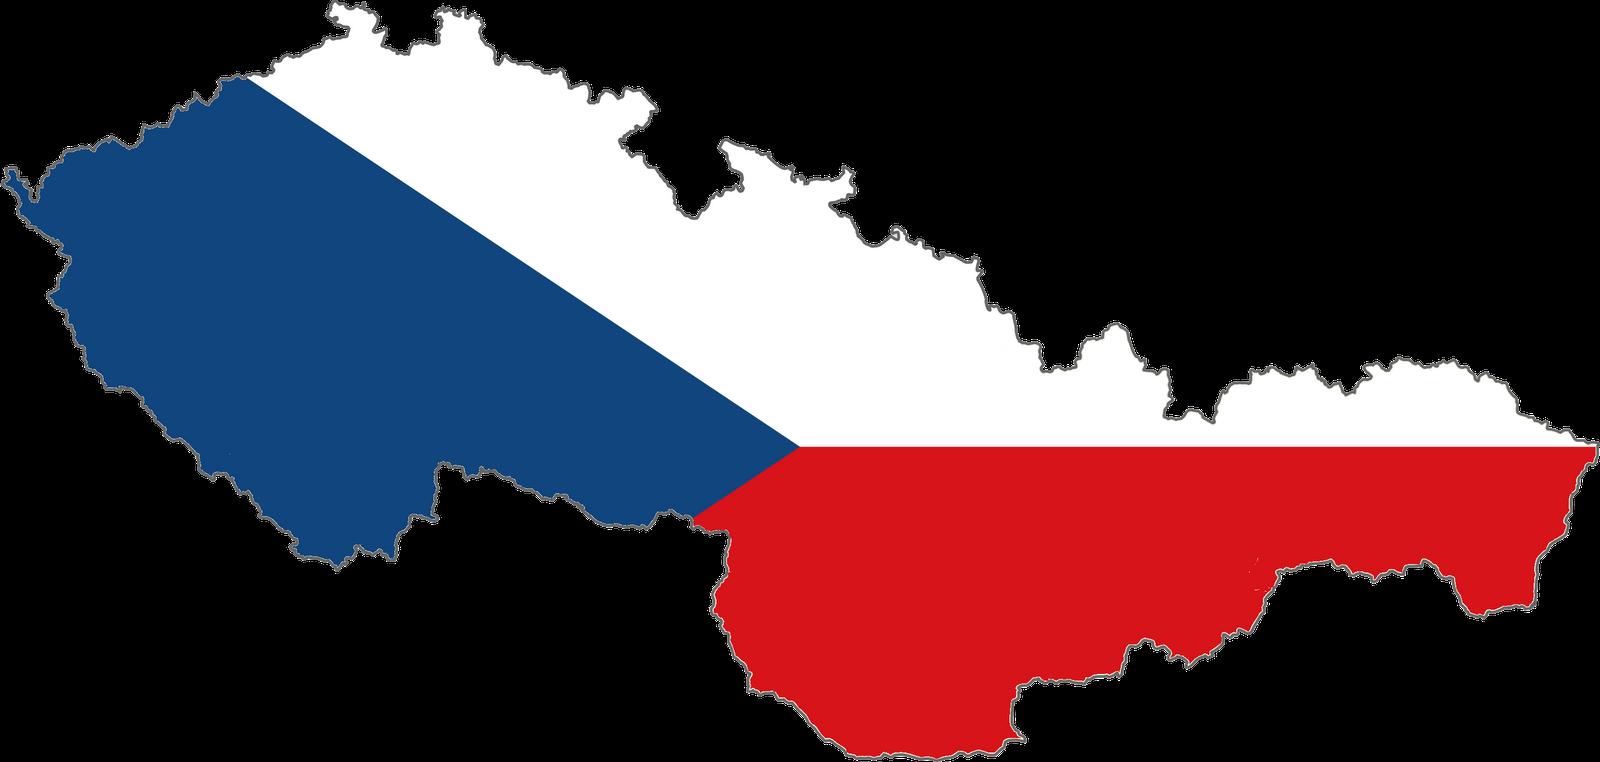 Den vzniku samostatného Československa, 28. 10. 1918